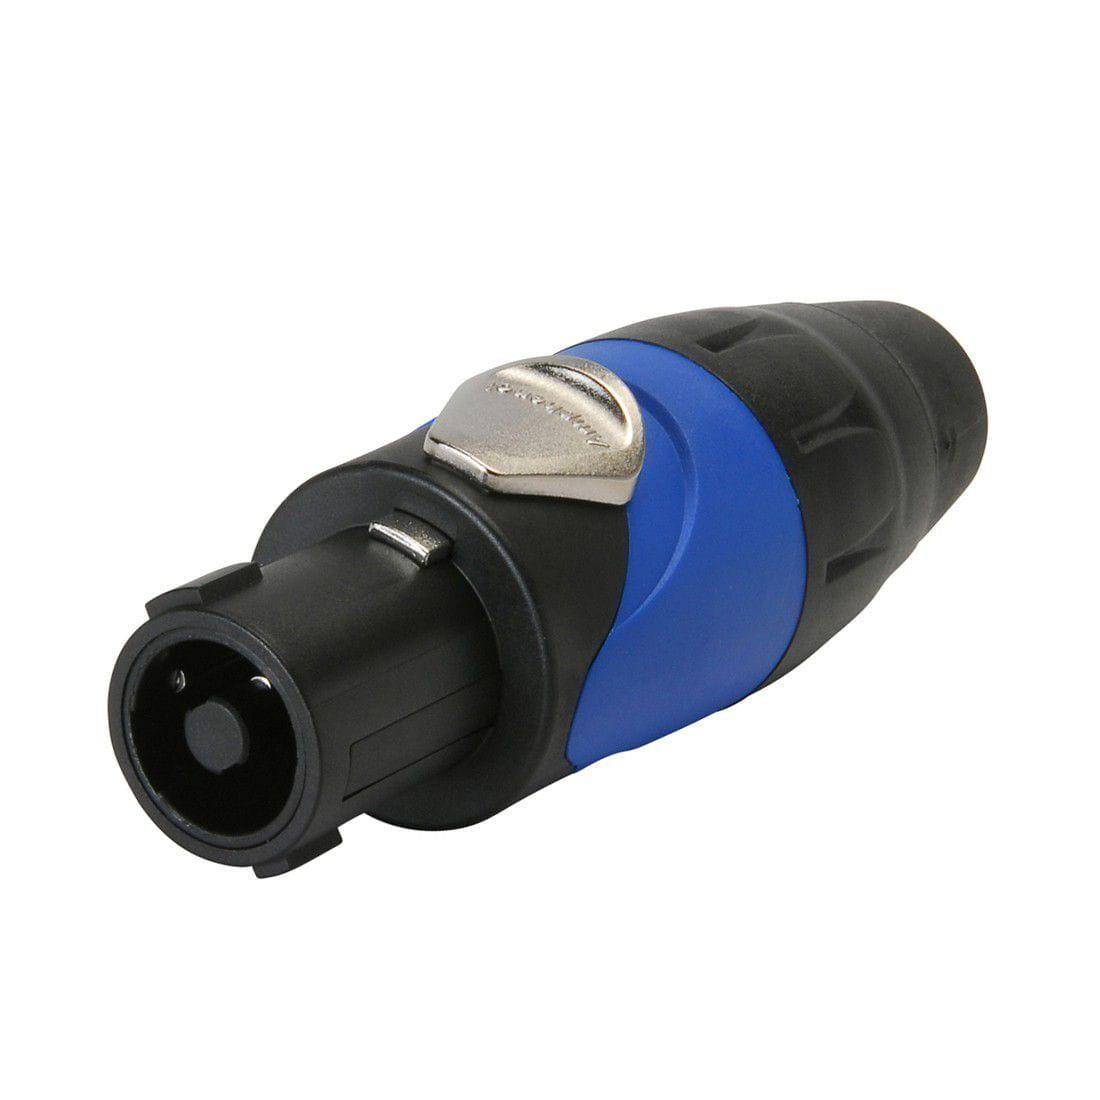 Amphenol Plug Conector Speakon Linha SP-4-F (4 Vias)